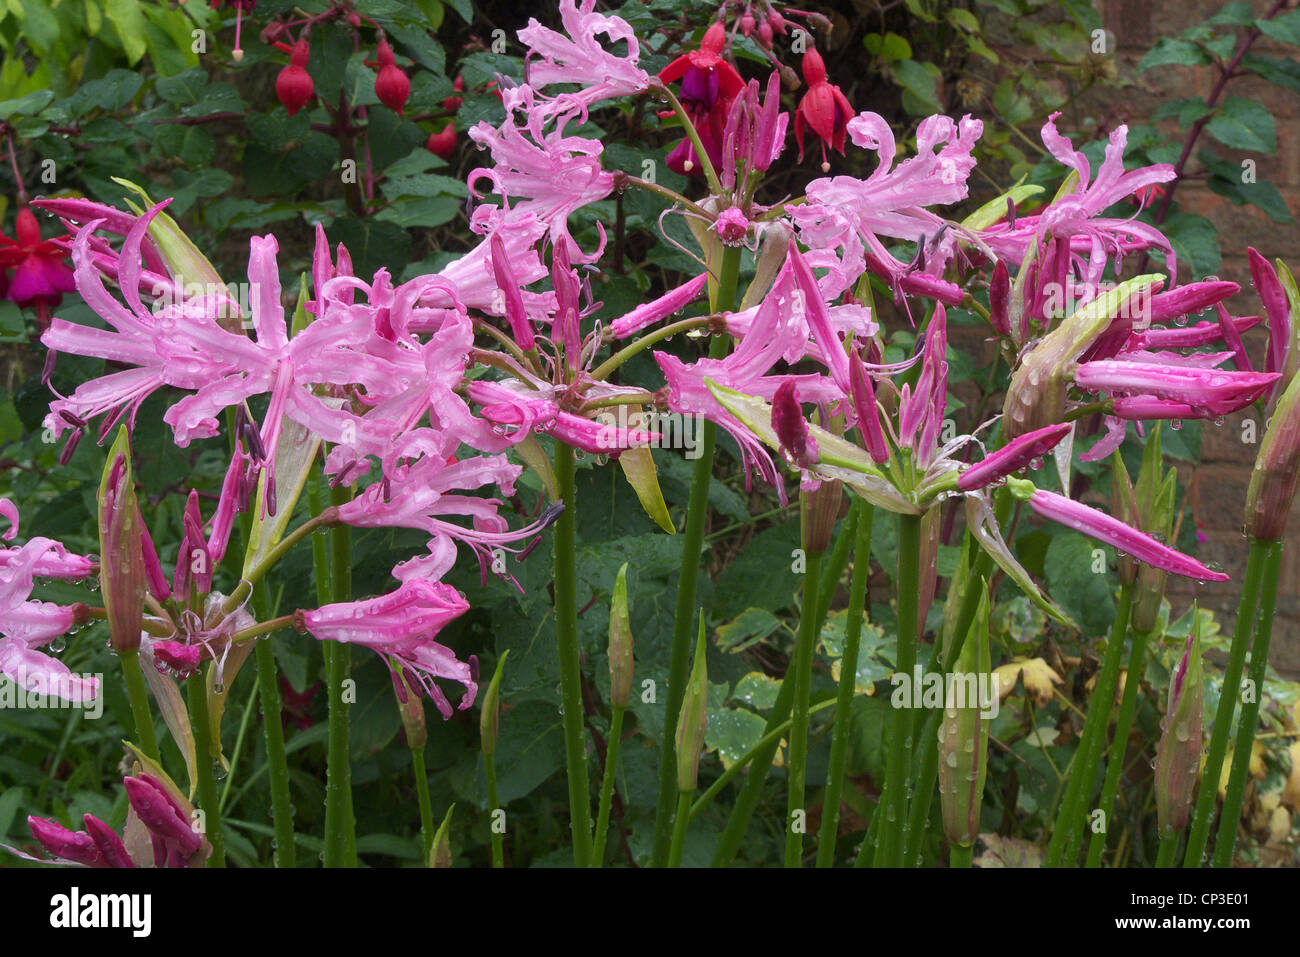 Nerine bowdenii in Flower - Stock Image